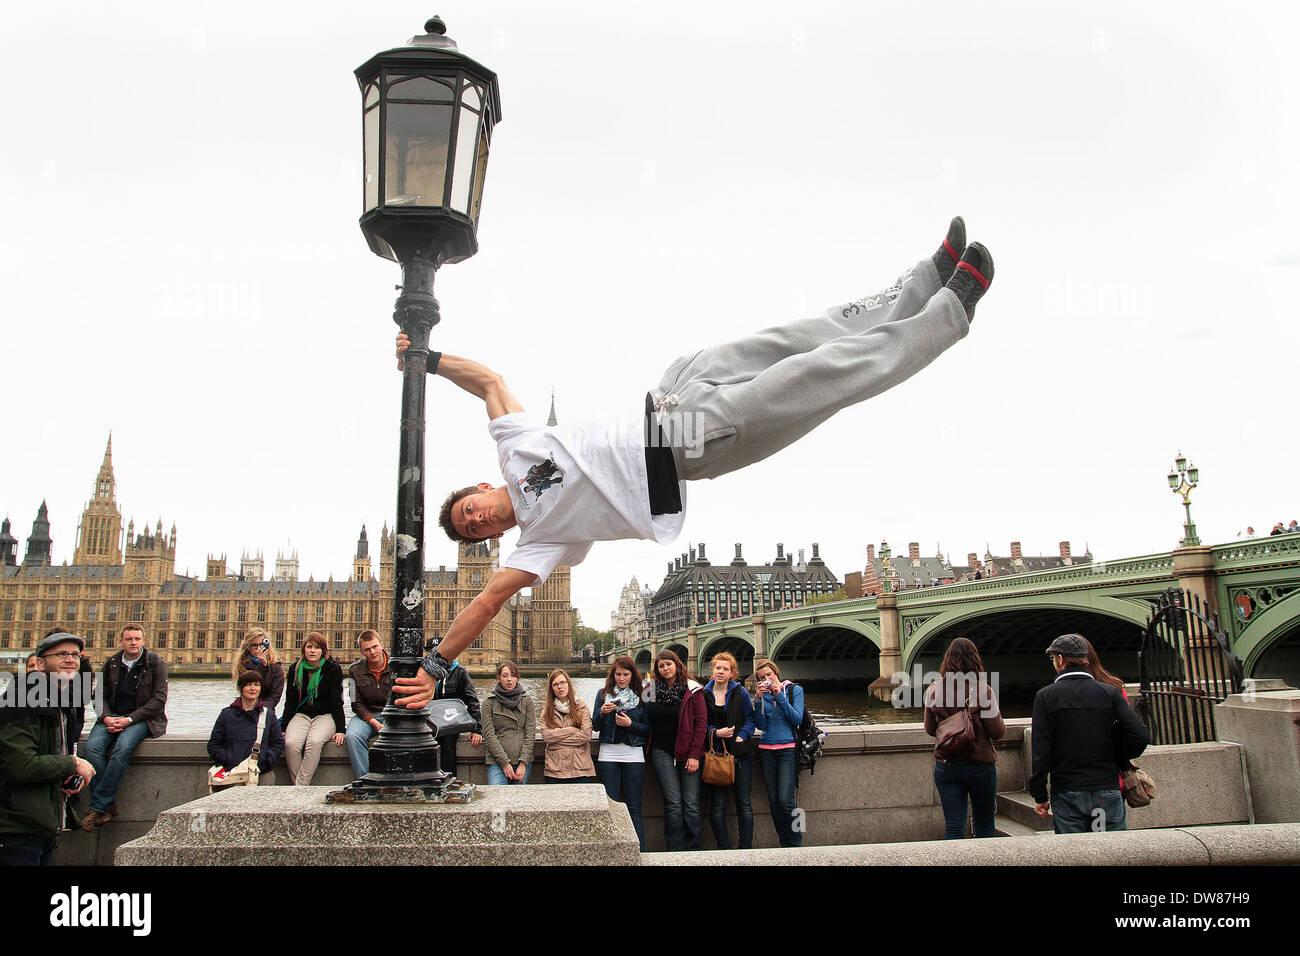 stuntman Chase Armitage in London - Stock Image